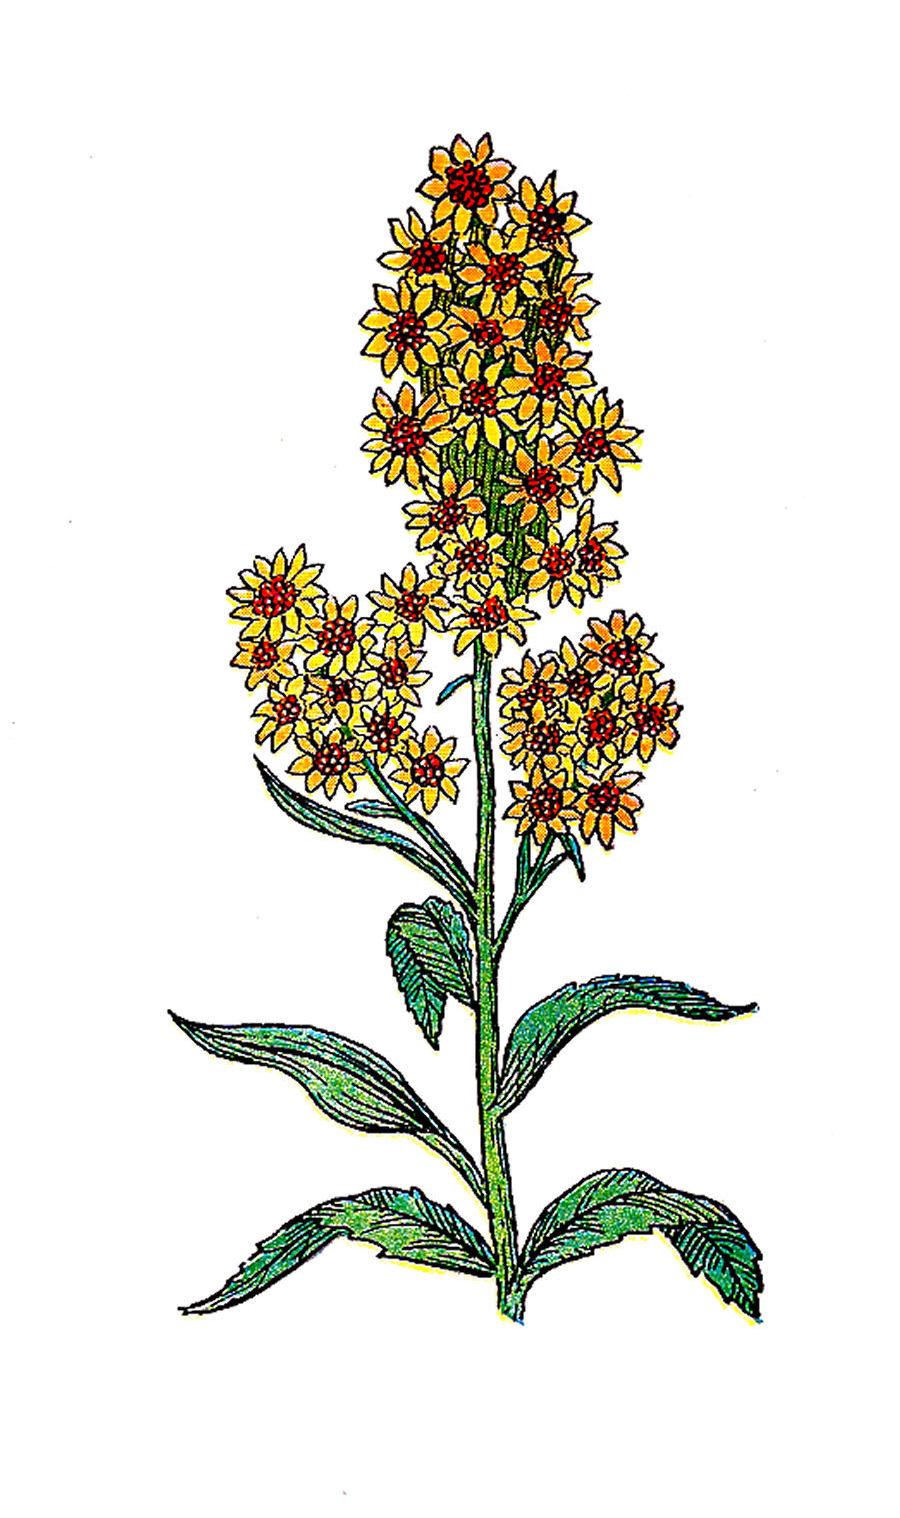 Free botanical clipart clip art royalty free stock Antique Images: Free Botanical Clip Art: Vintage Herb Illustration ... clip art royalty free stock